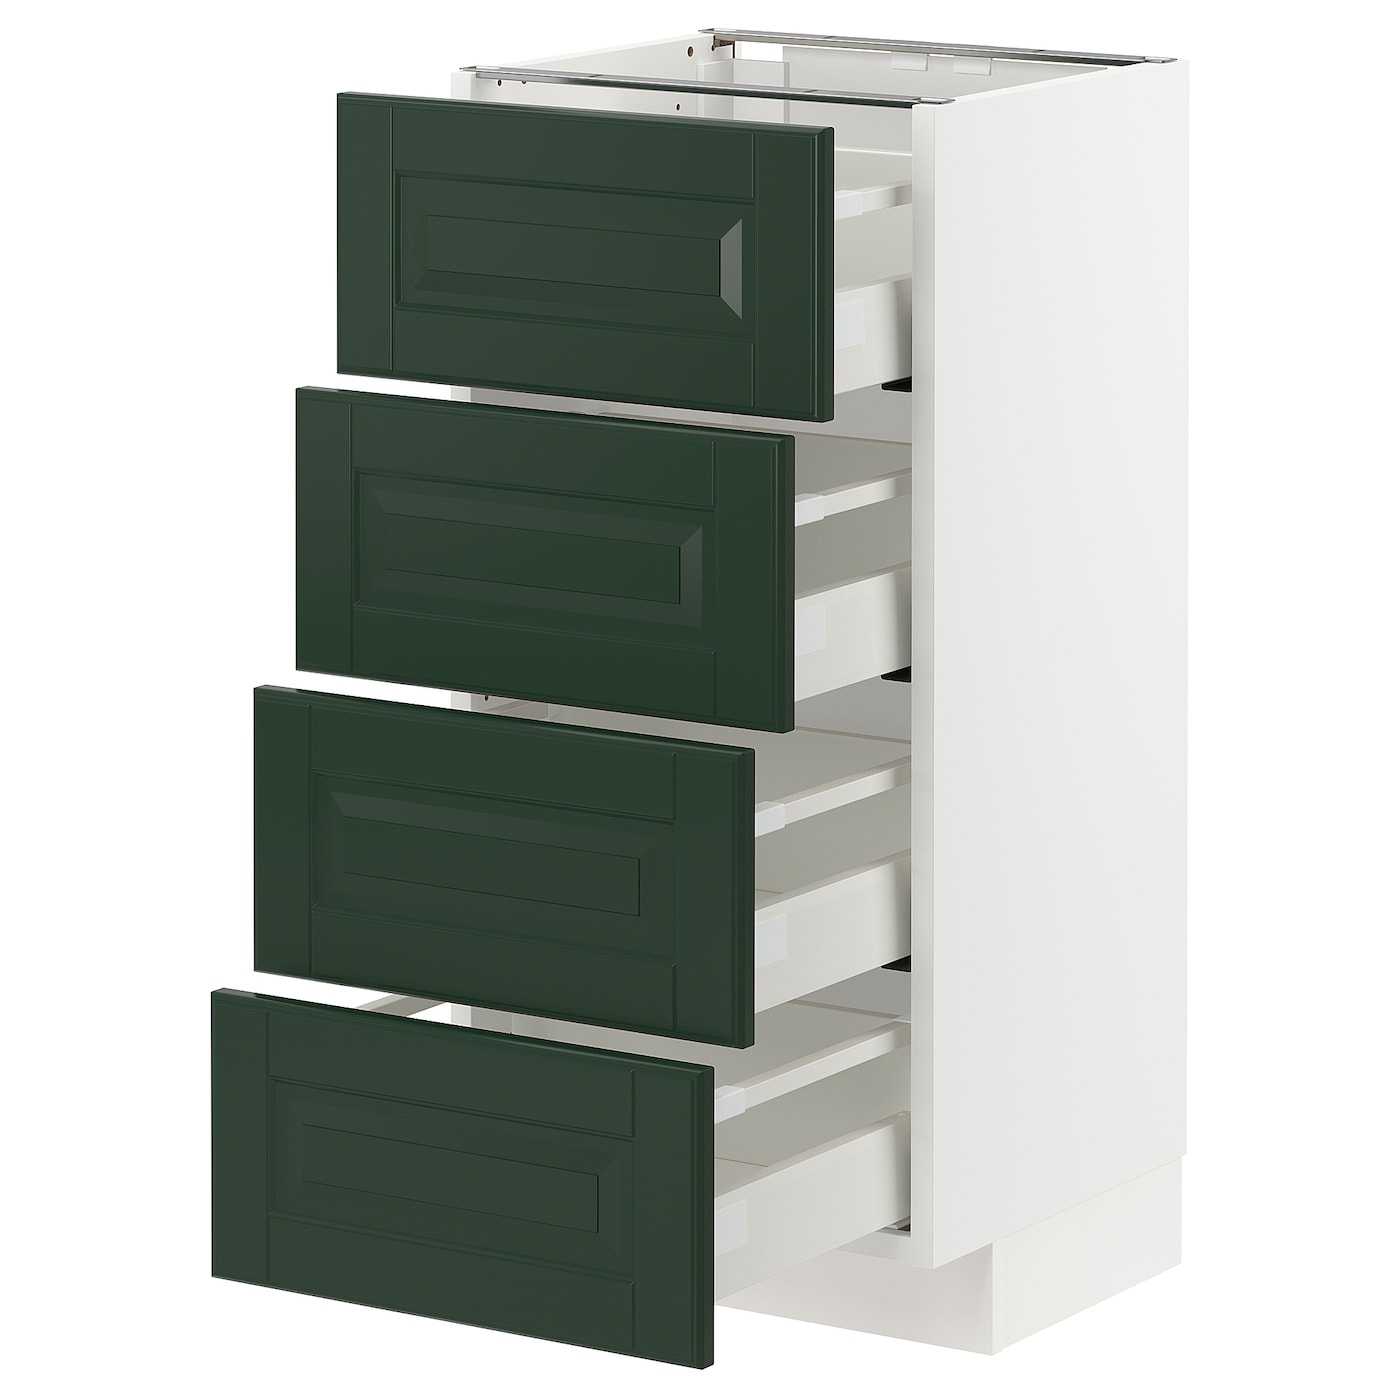 Ikea Metod Maximera Unterschr 4 Fronten 4 Schubladen Weiss Bodbyn Dunkelgrun 40x37 Cm Moebel Suchmaschine Ladendirekt De